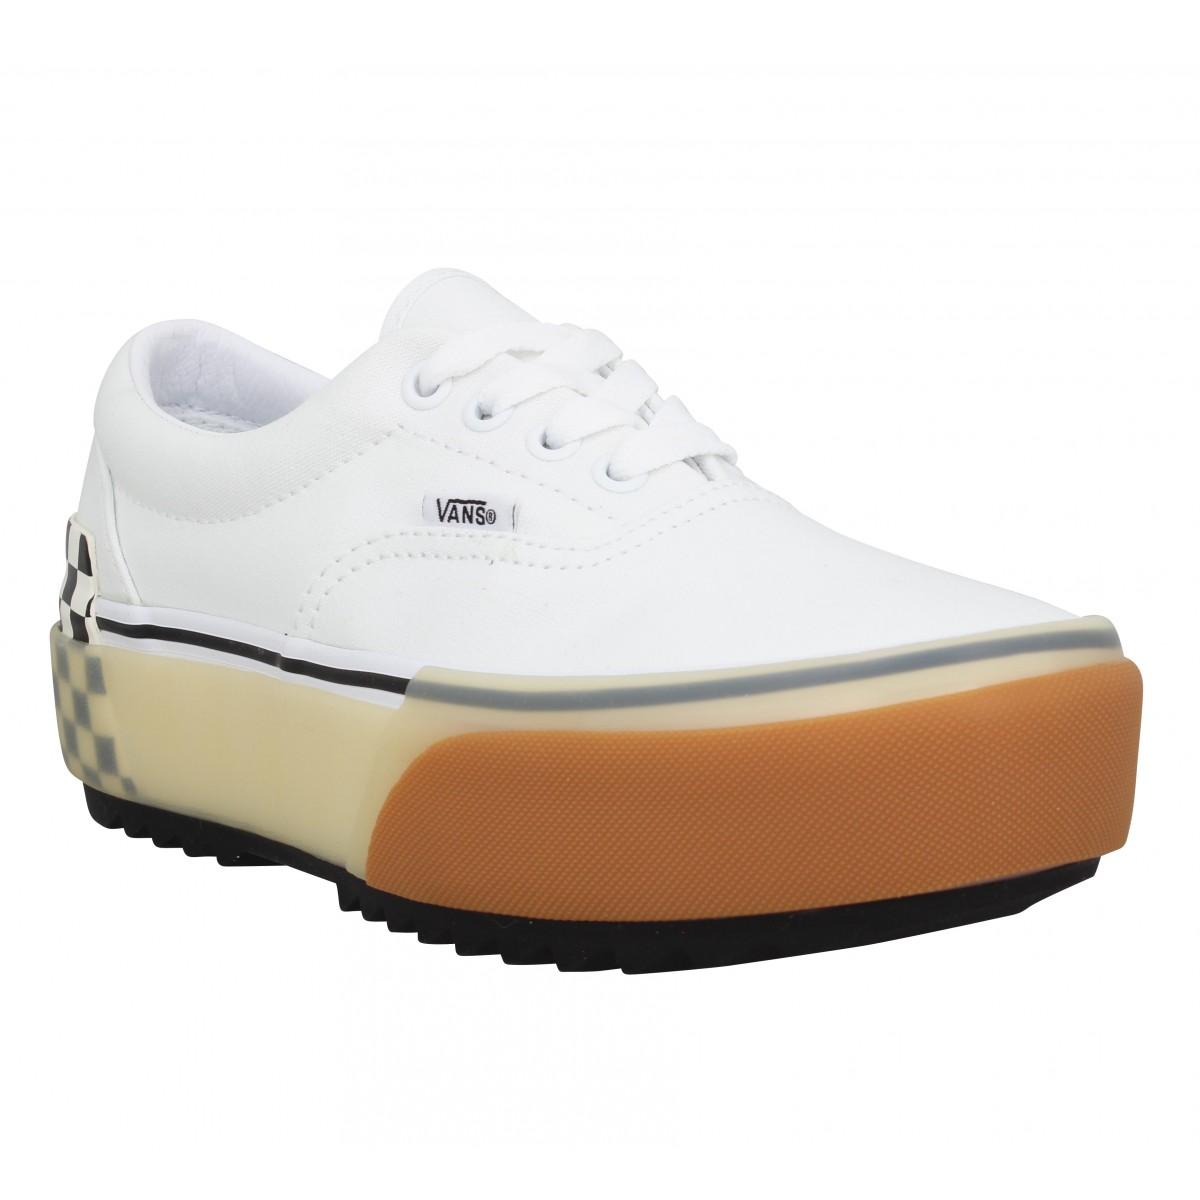 Vans Femme Era Stacked Toile -36-white...